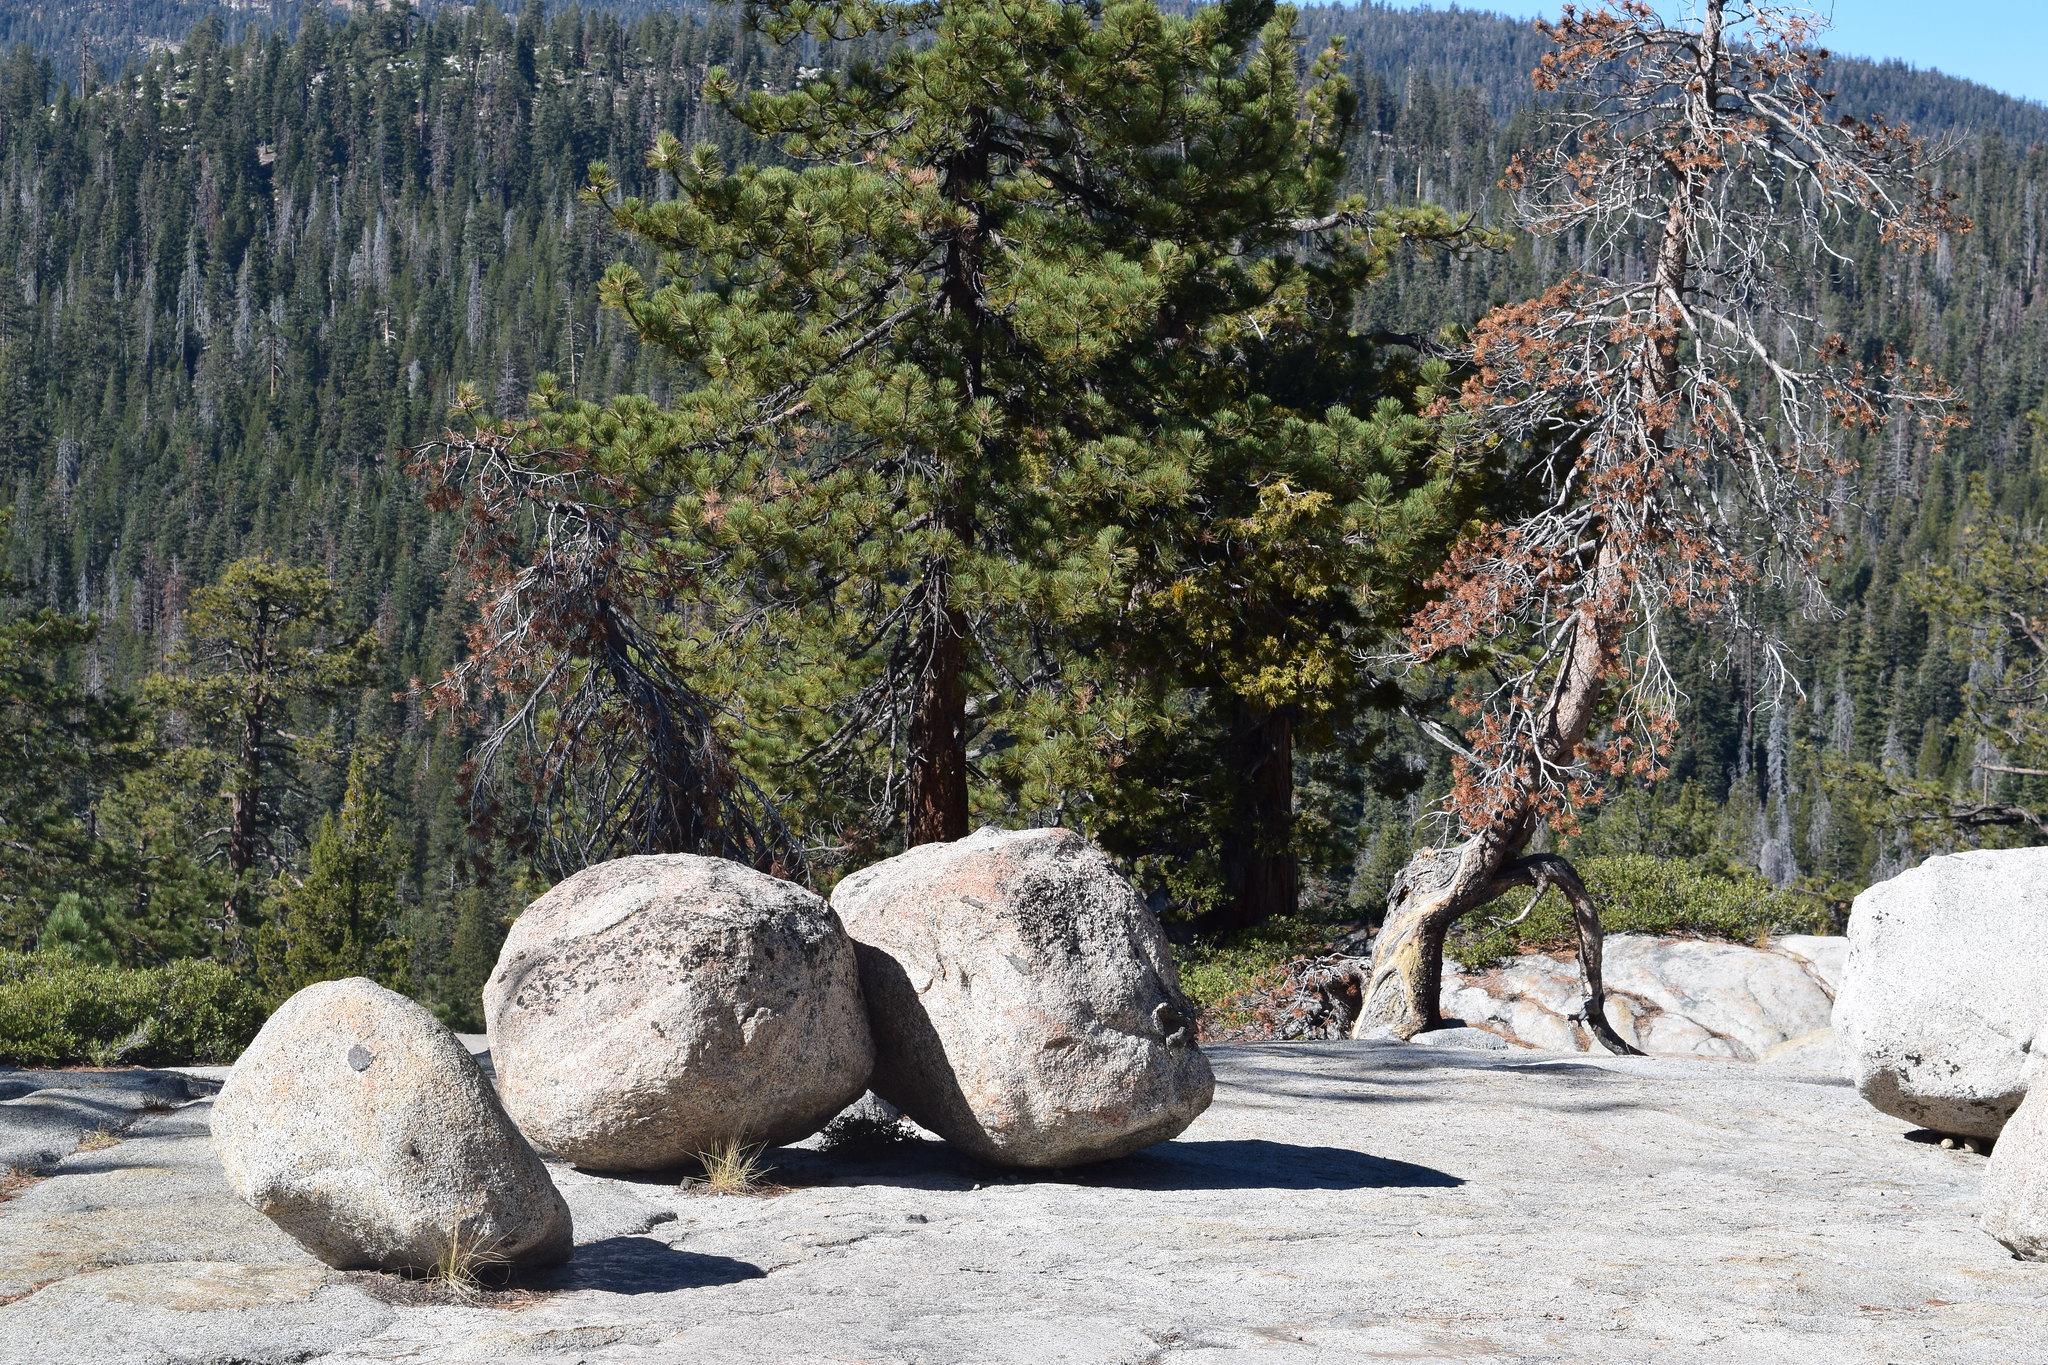 Yosemite National Park-Tuolumne Road to Tioga Pass-Random Rocks